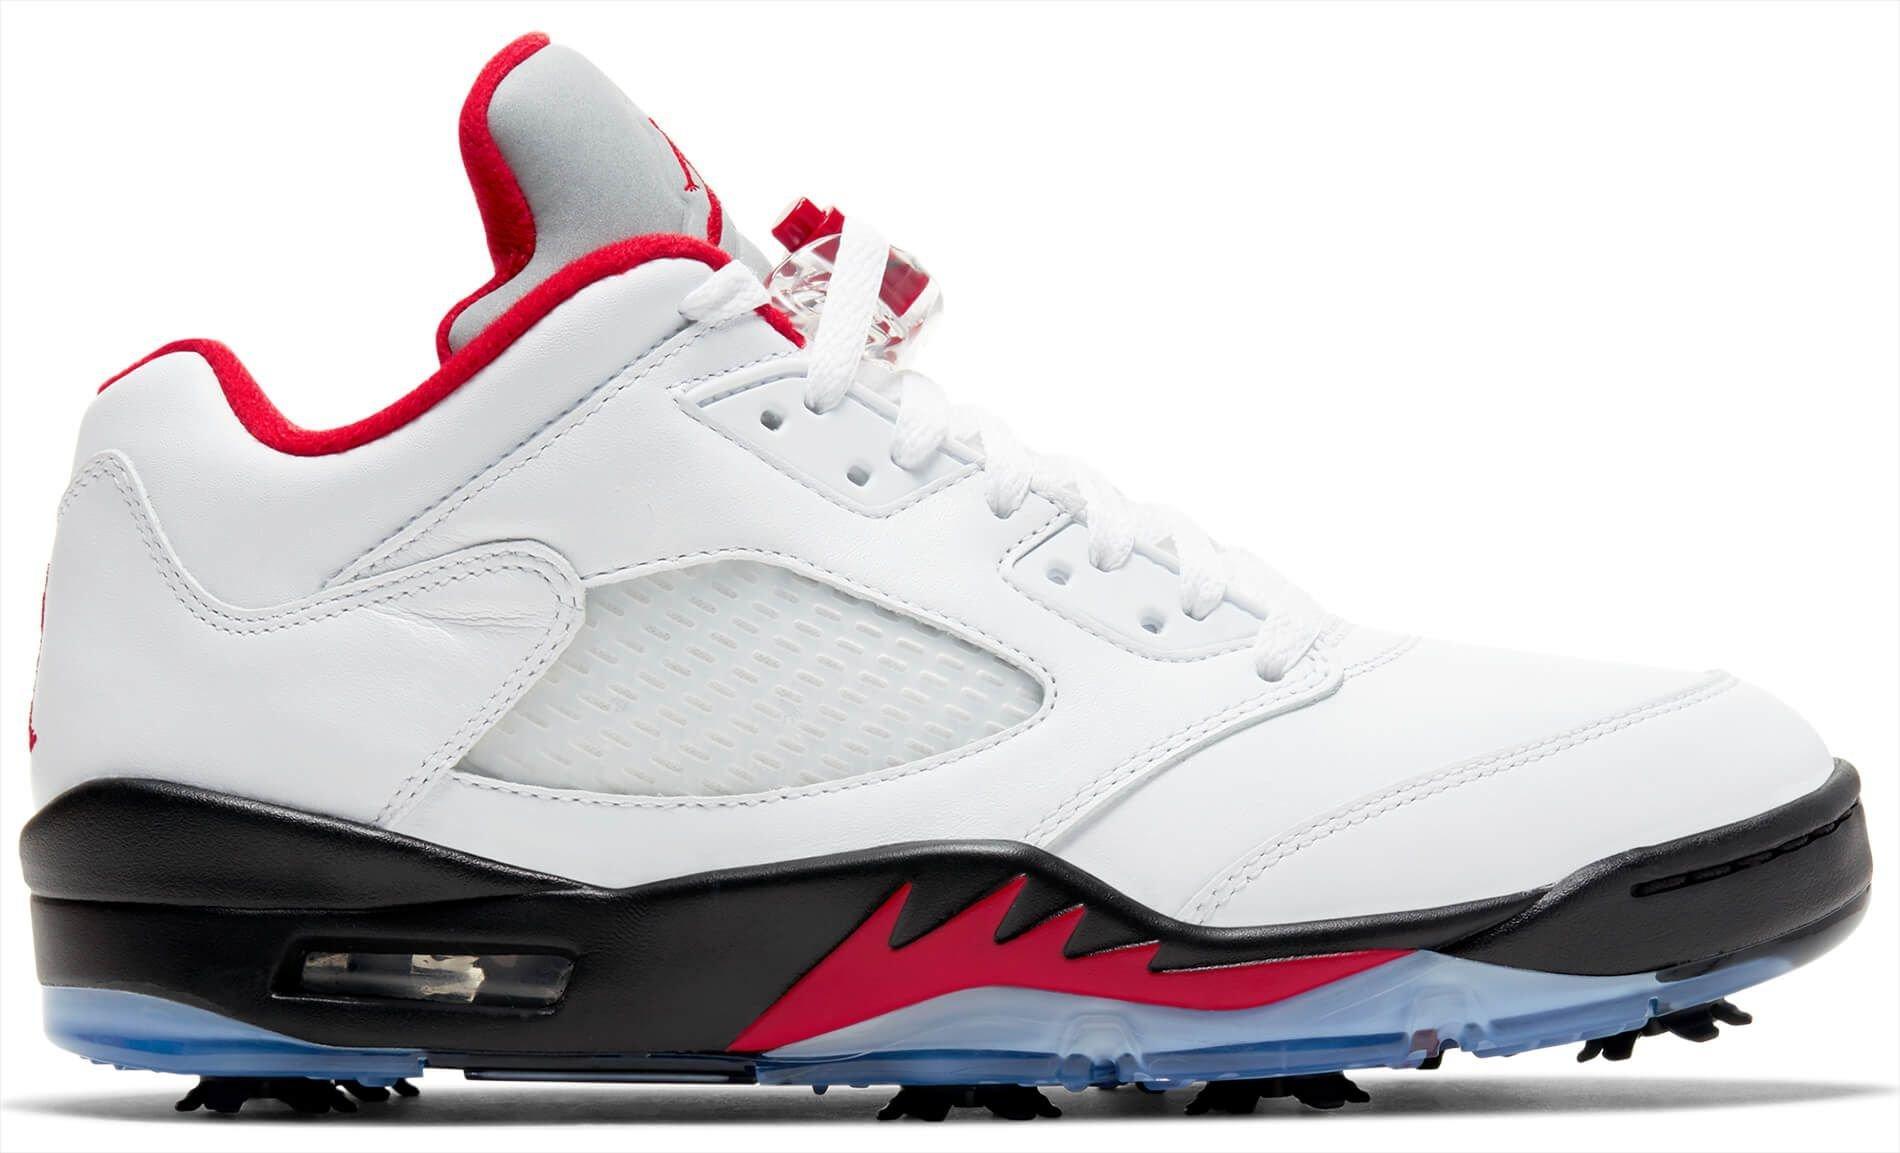 Nike Air Jordan V Low Golf Shoes White